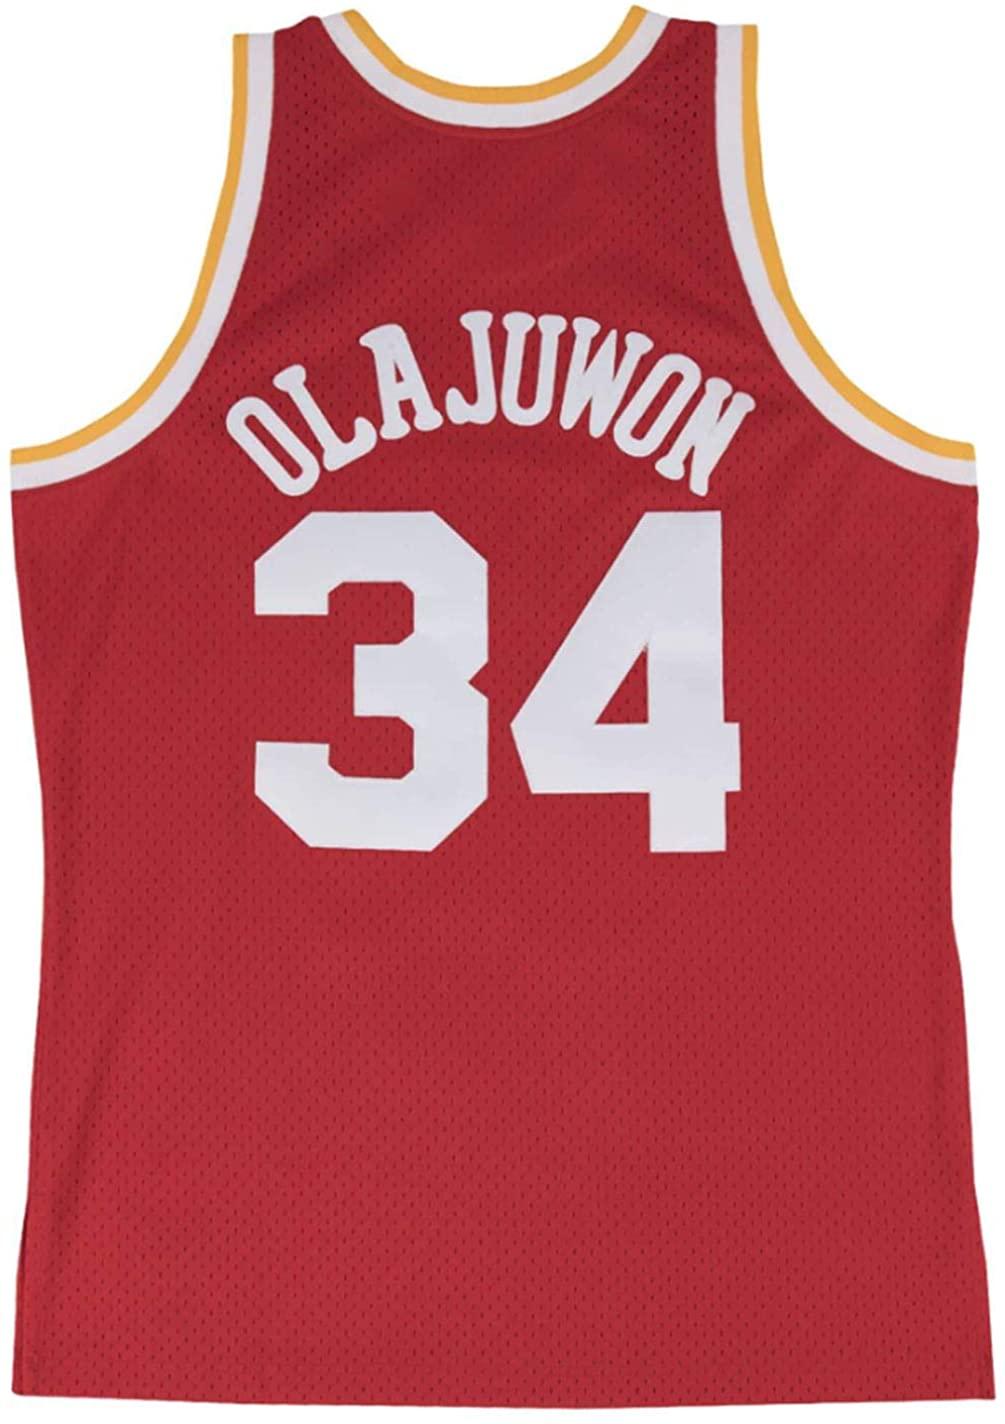 Mitchell & Ness Hakeem Olajuwon Houston Rockets Men's Red Swingman Player Jersey